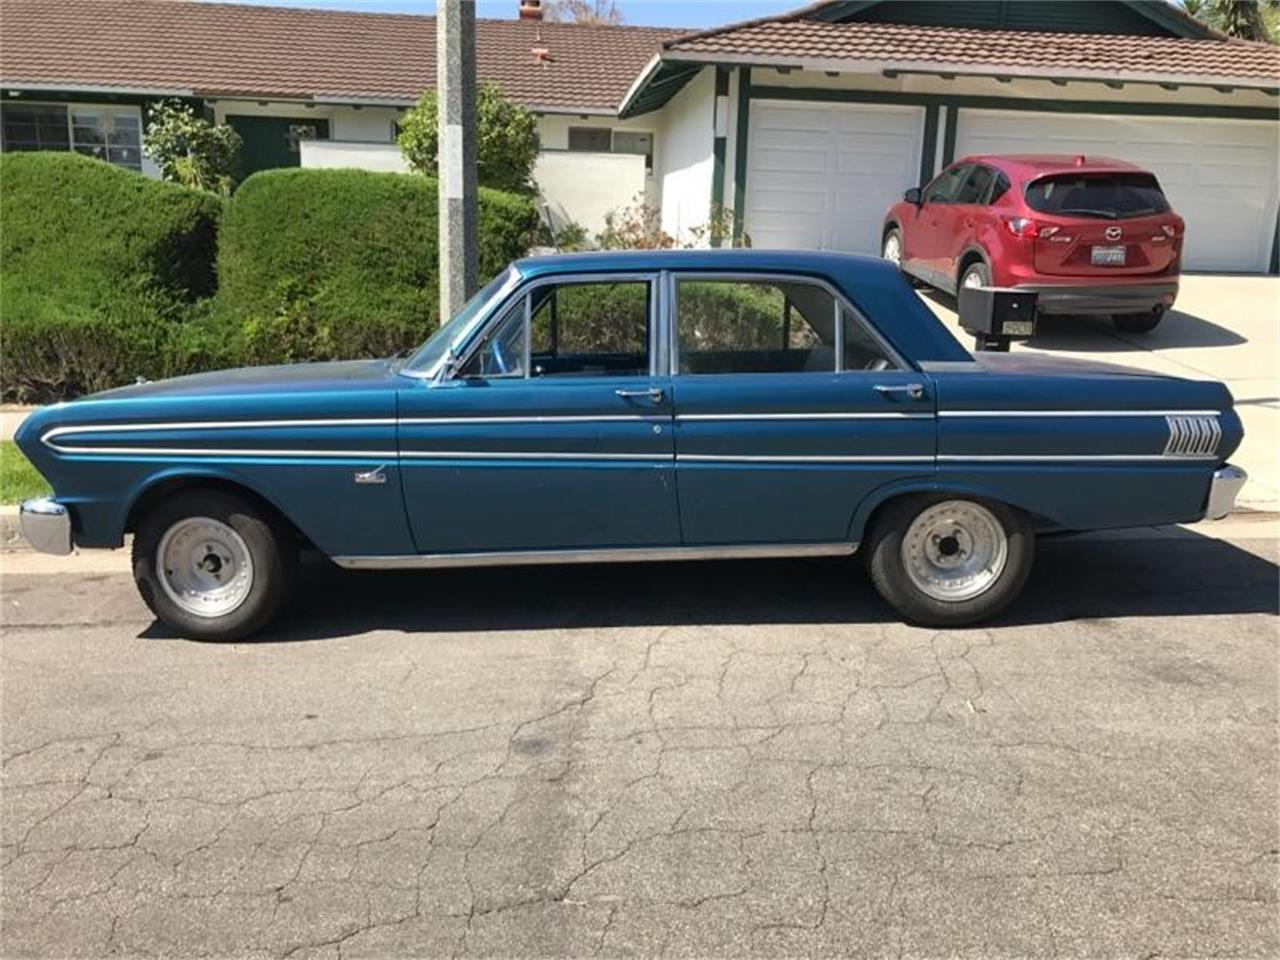 1964 Ford Falcon For Sale Classiccars Com Cc 1153152